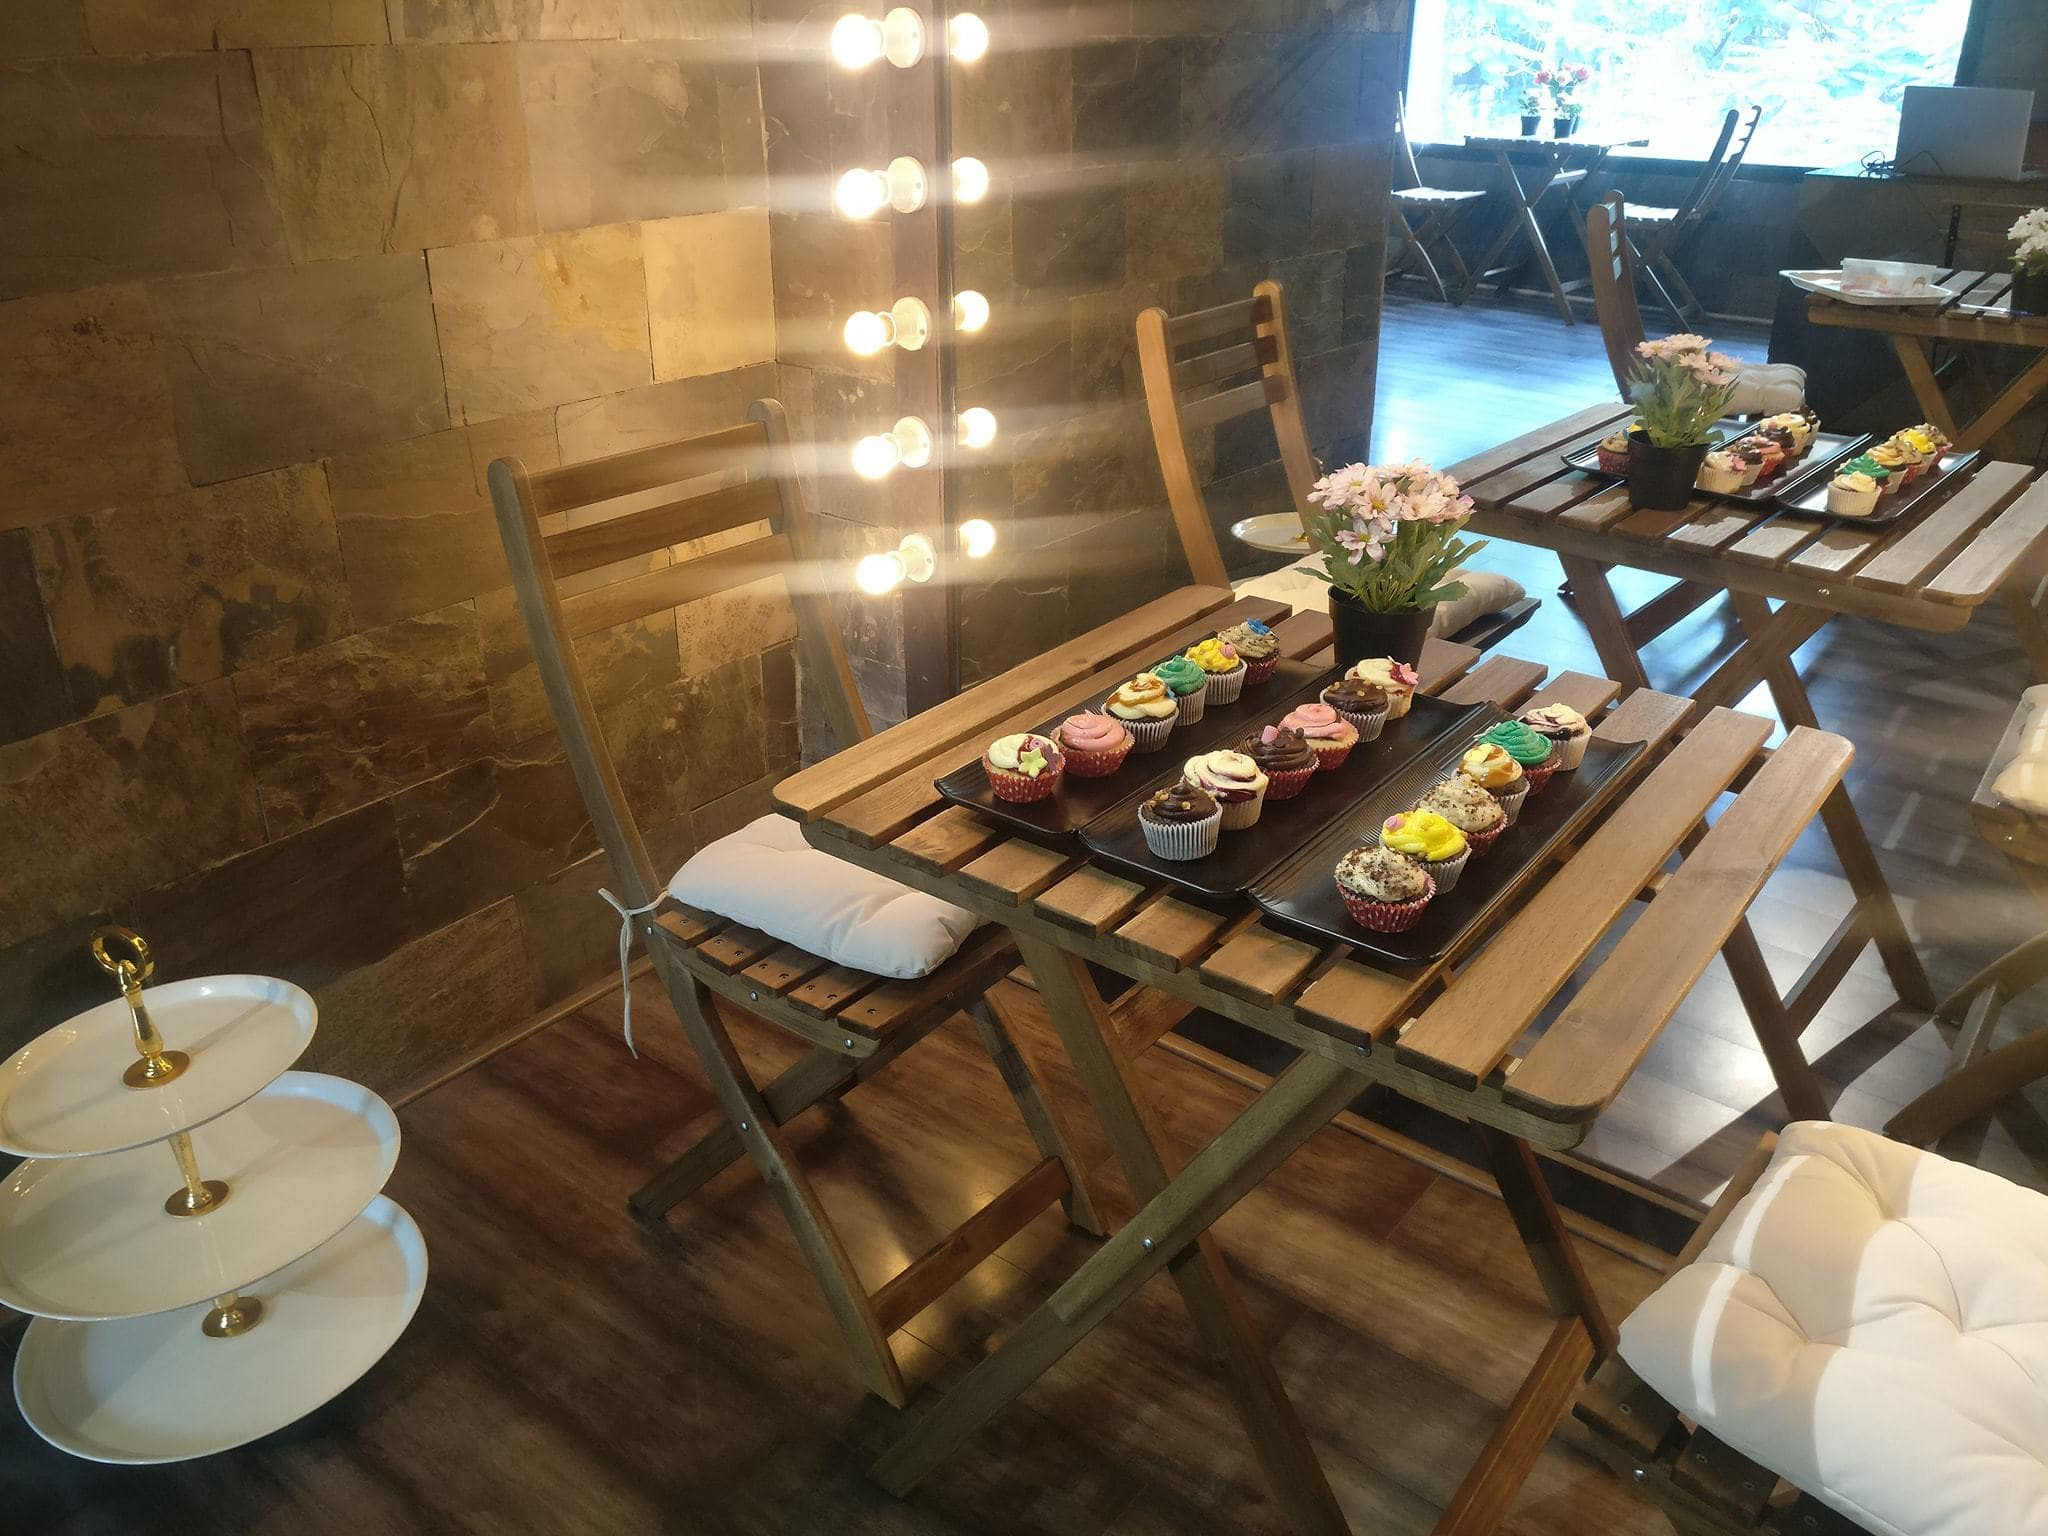 Barkkha's Patisserie, Banjara Hills, Hyderabad - Restaurant